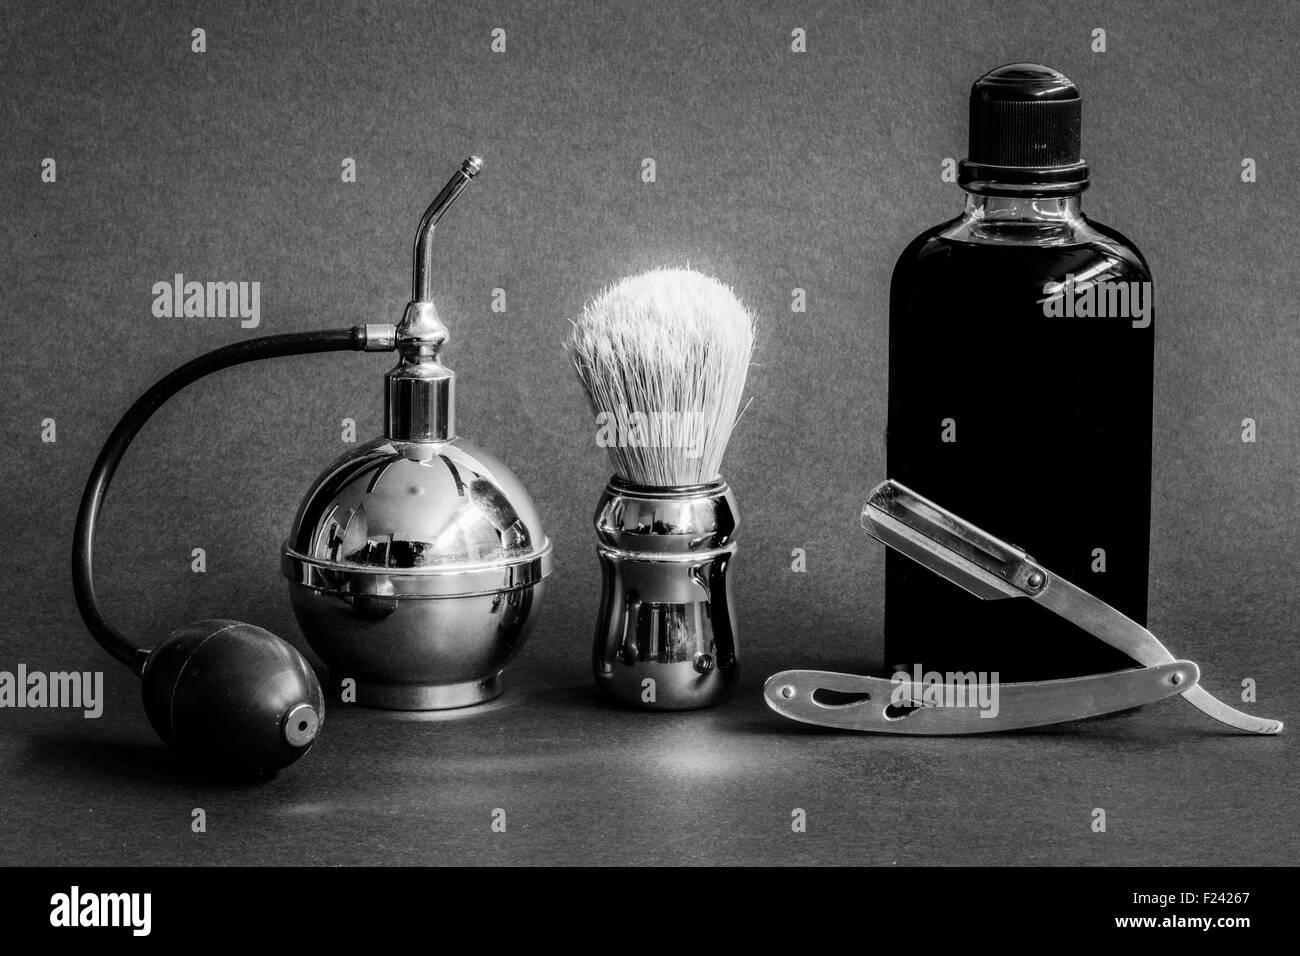 vaporizer shaving brush and perfume - Stock Image